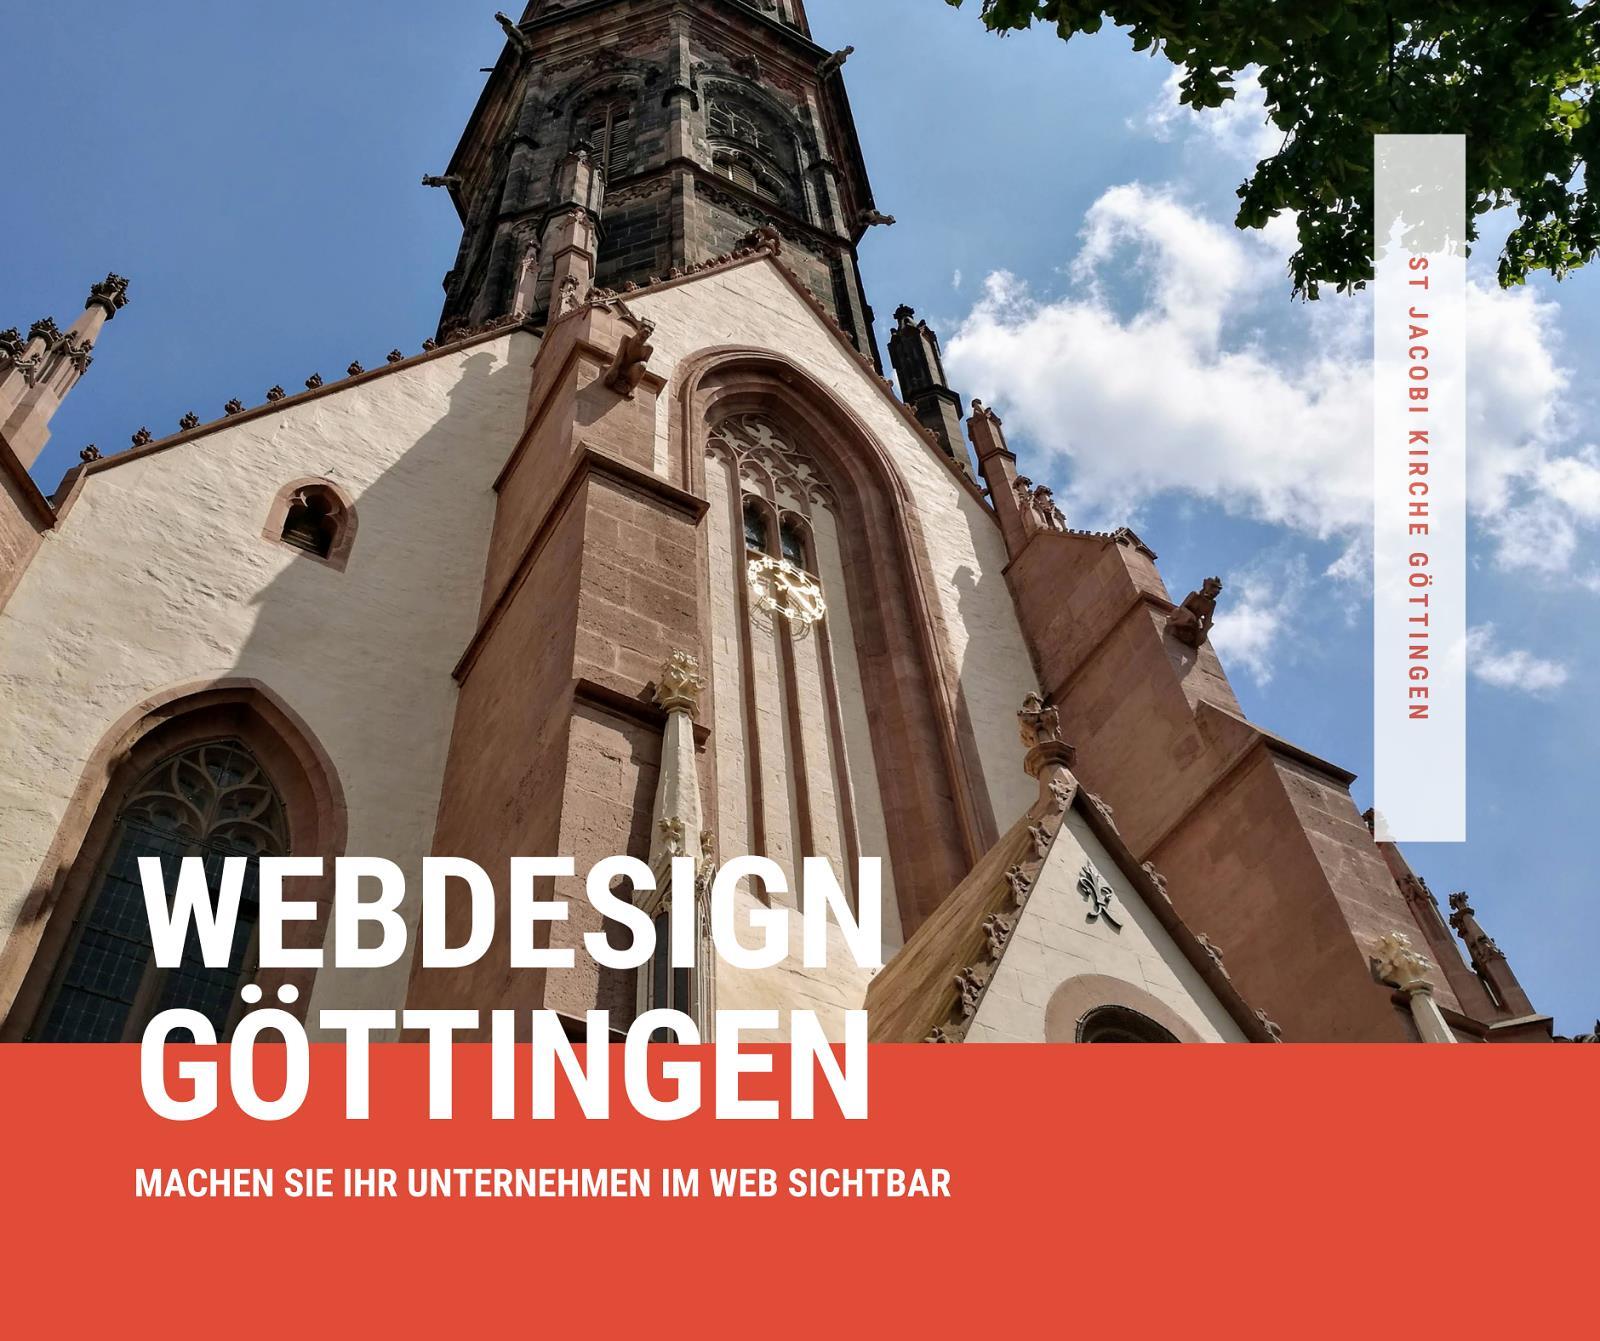 Webdesign Göttingen